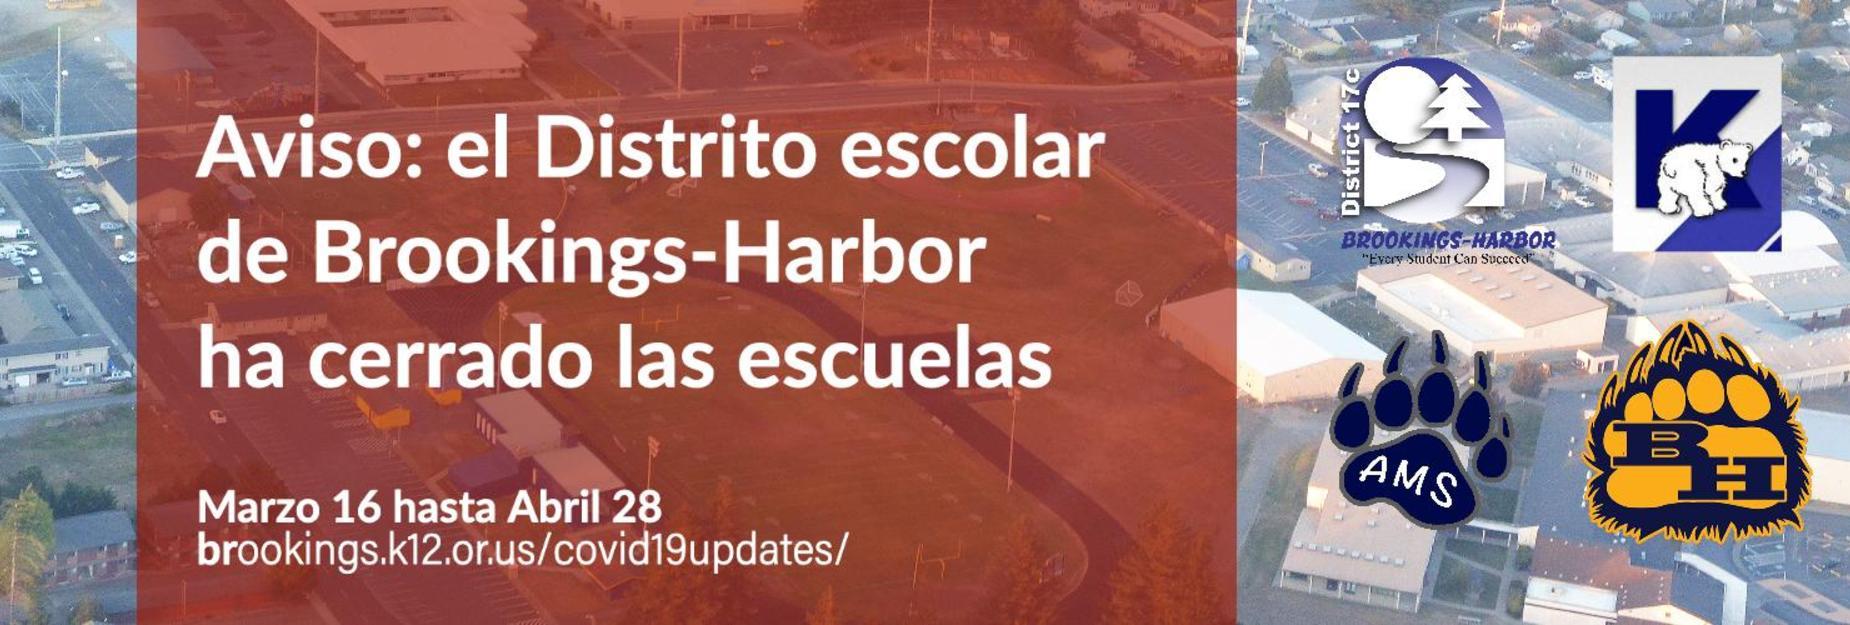 Extended closure espanol